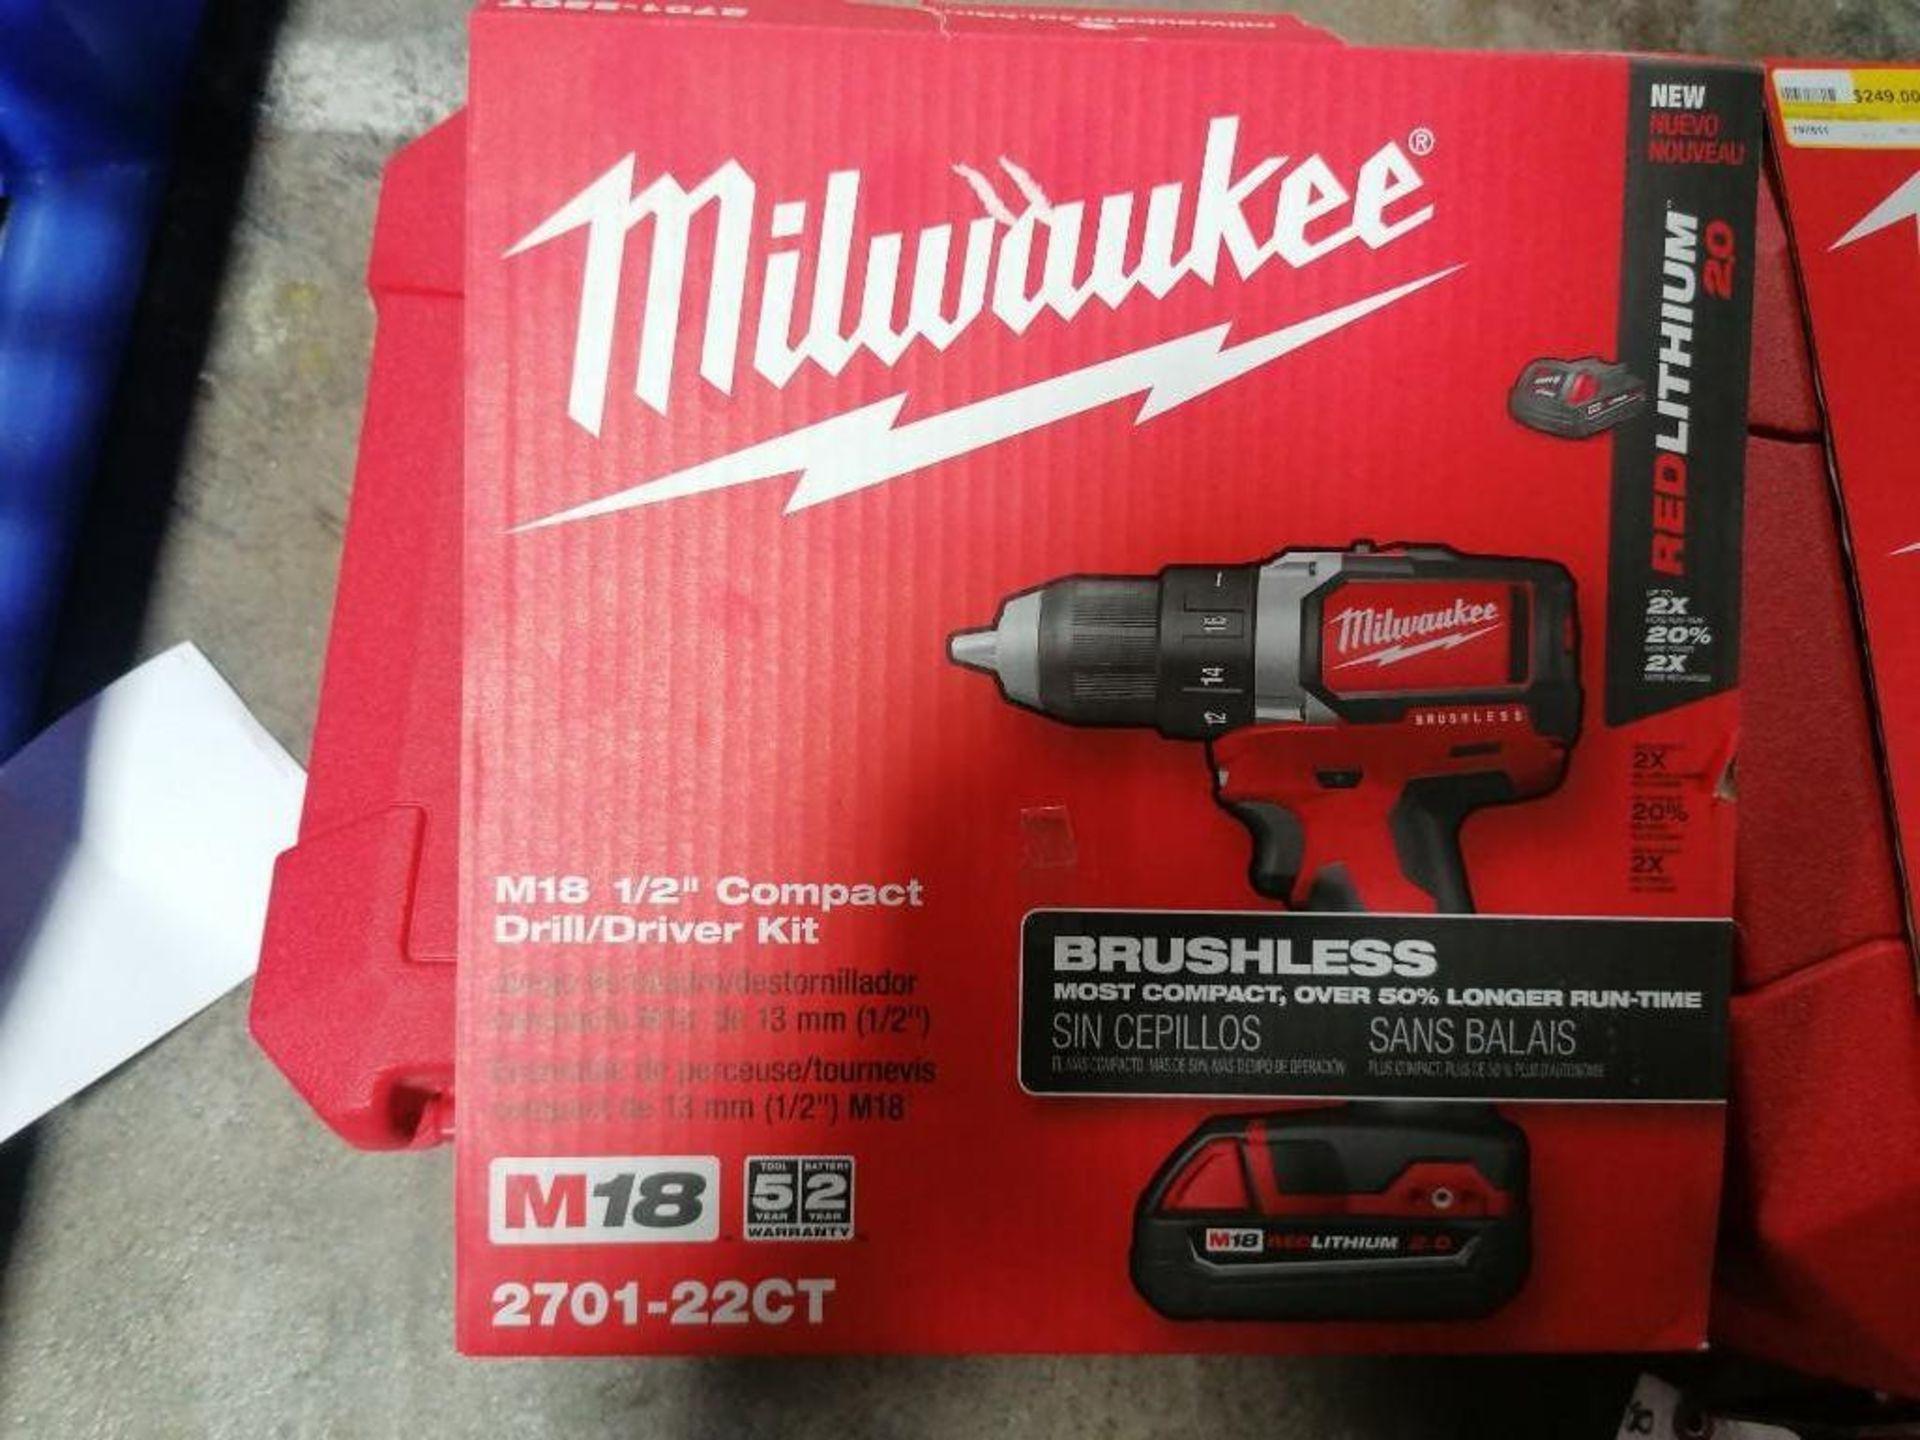 "(1) NEW Milwaukee M18 1/2"" Compact Drill Kit & (1) NEW Milwaukee M18 Cordless Recip Saw Kit. Located - Image 3 of 3"